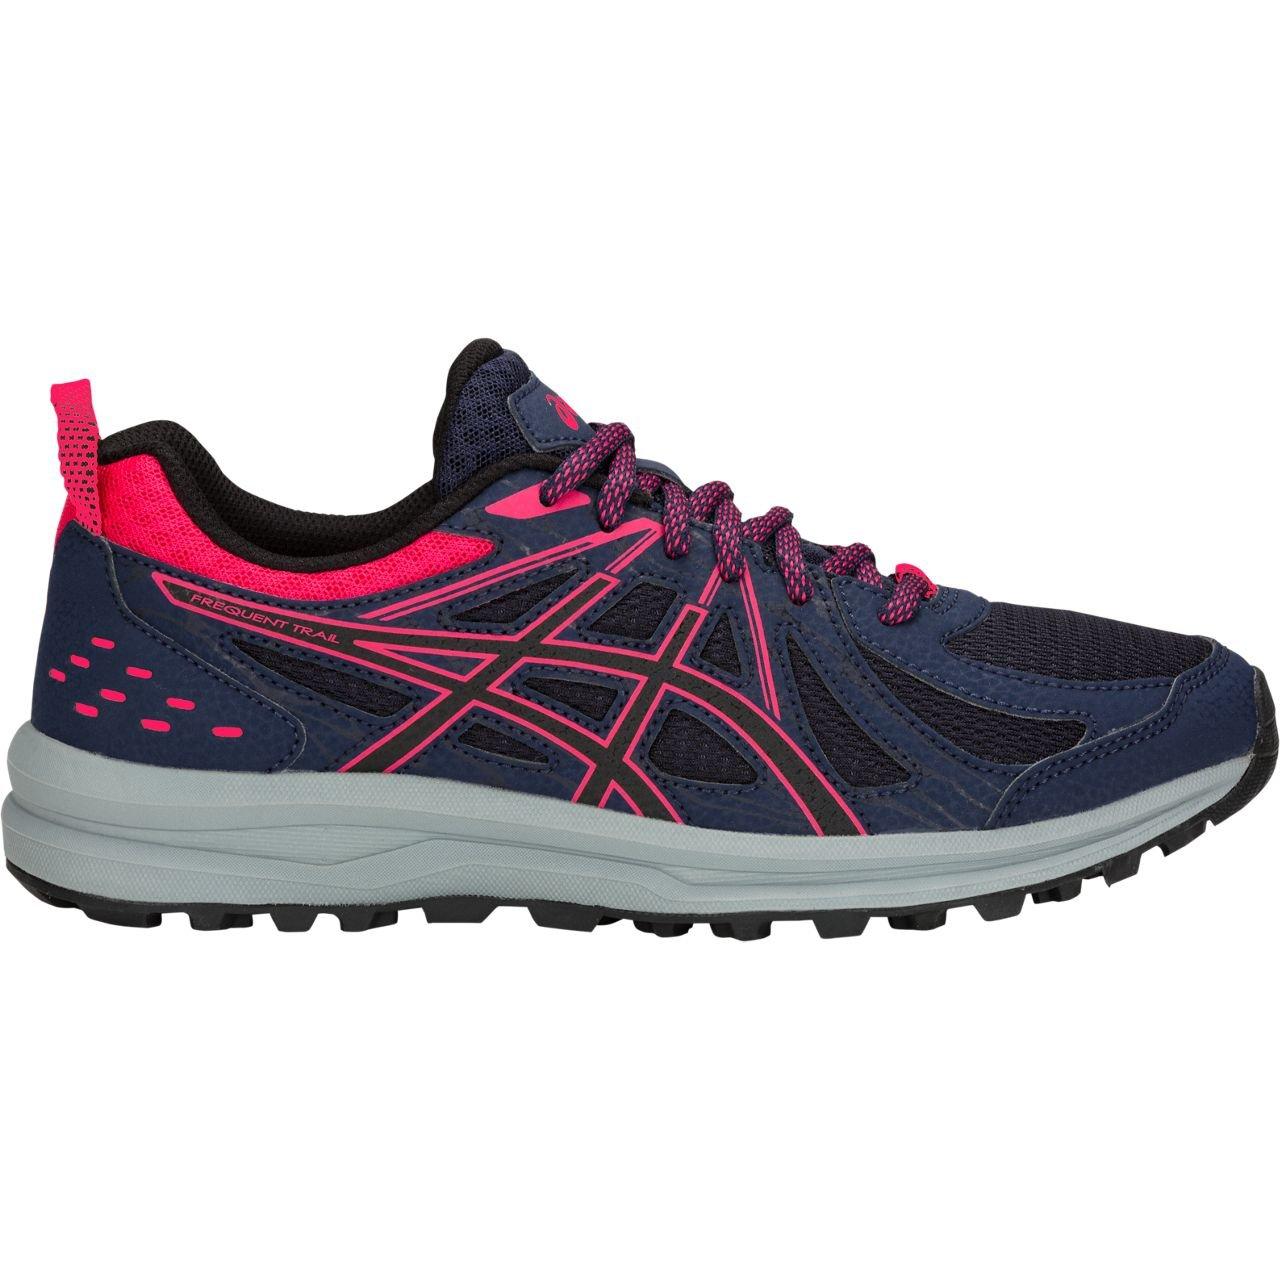 ASICS Women's Frequent Trail Running Shoe B07885WLDB 5 B(M) US|Peacoat/Pixel Pink